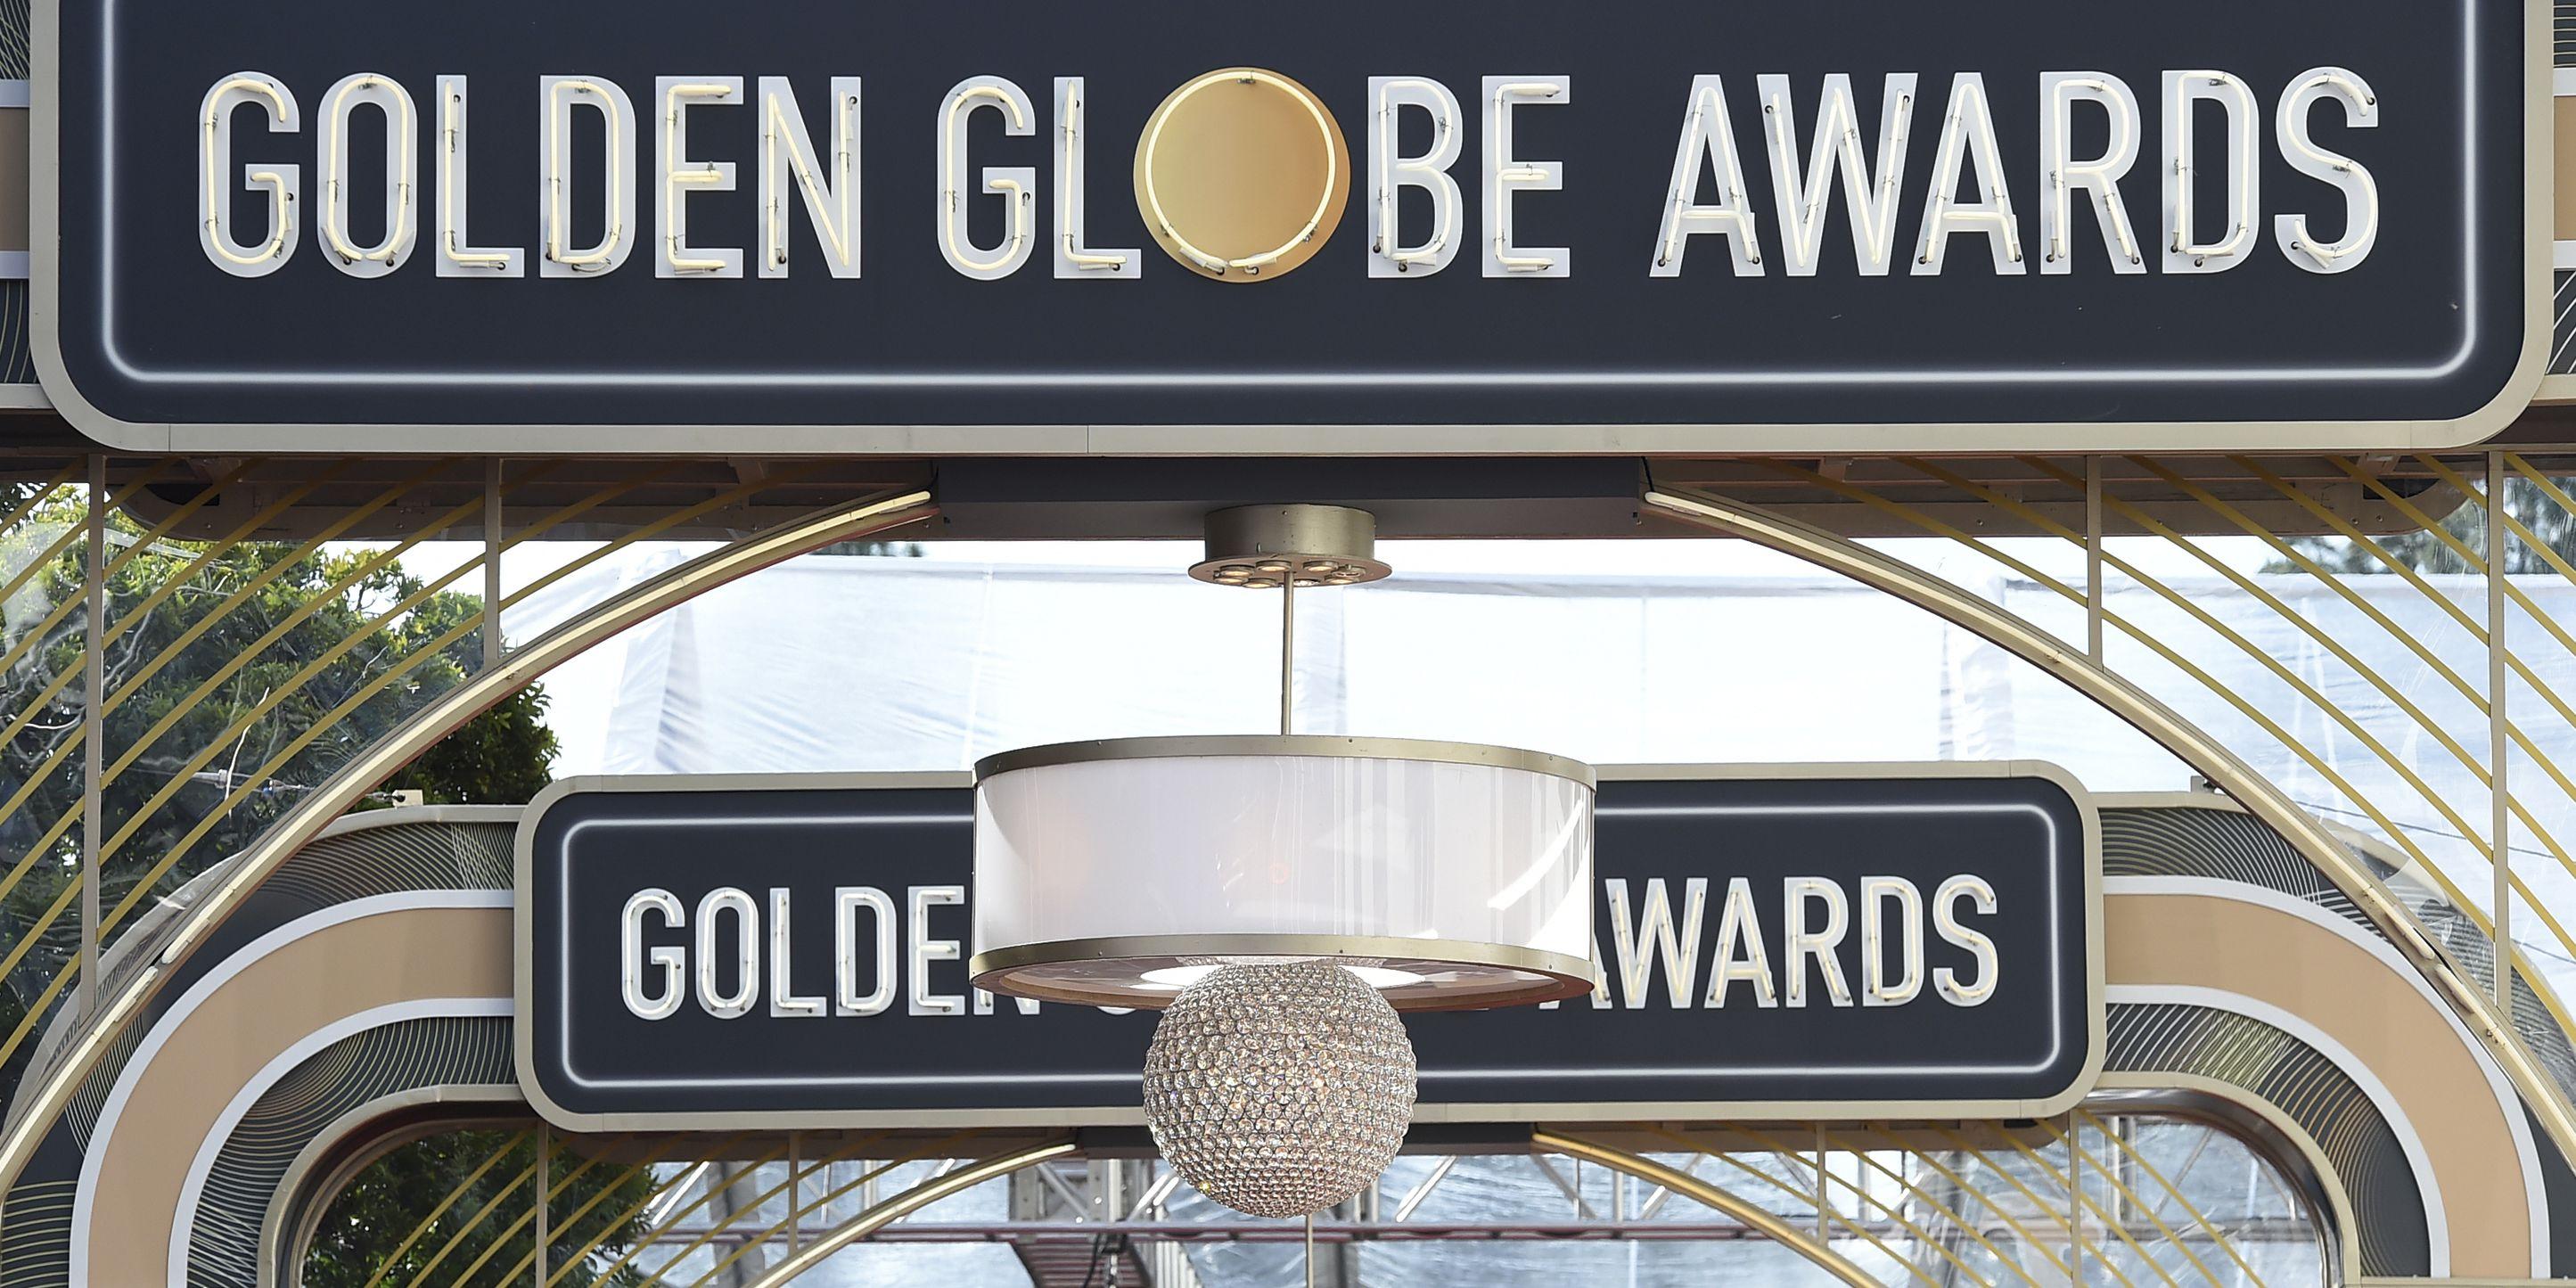 By split screen, Fey and Poehler kick off bicoastal Globes